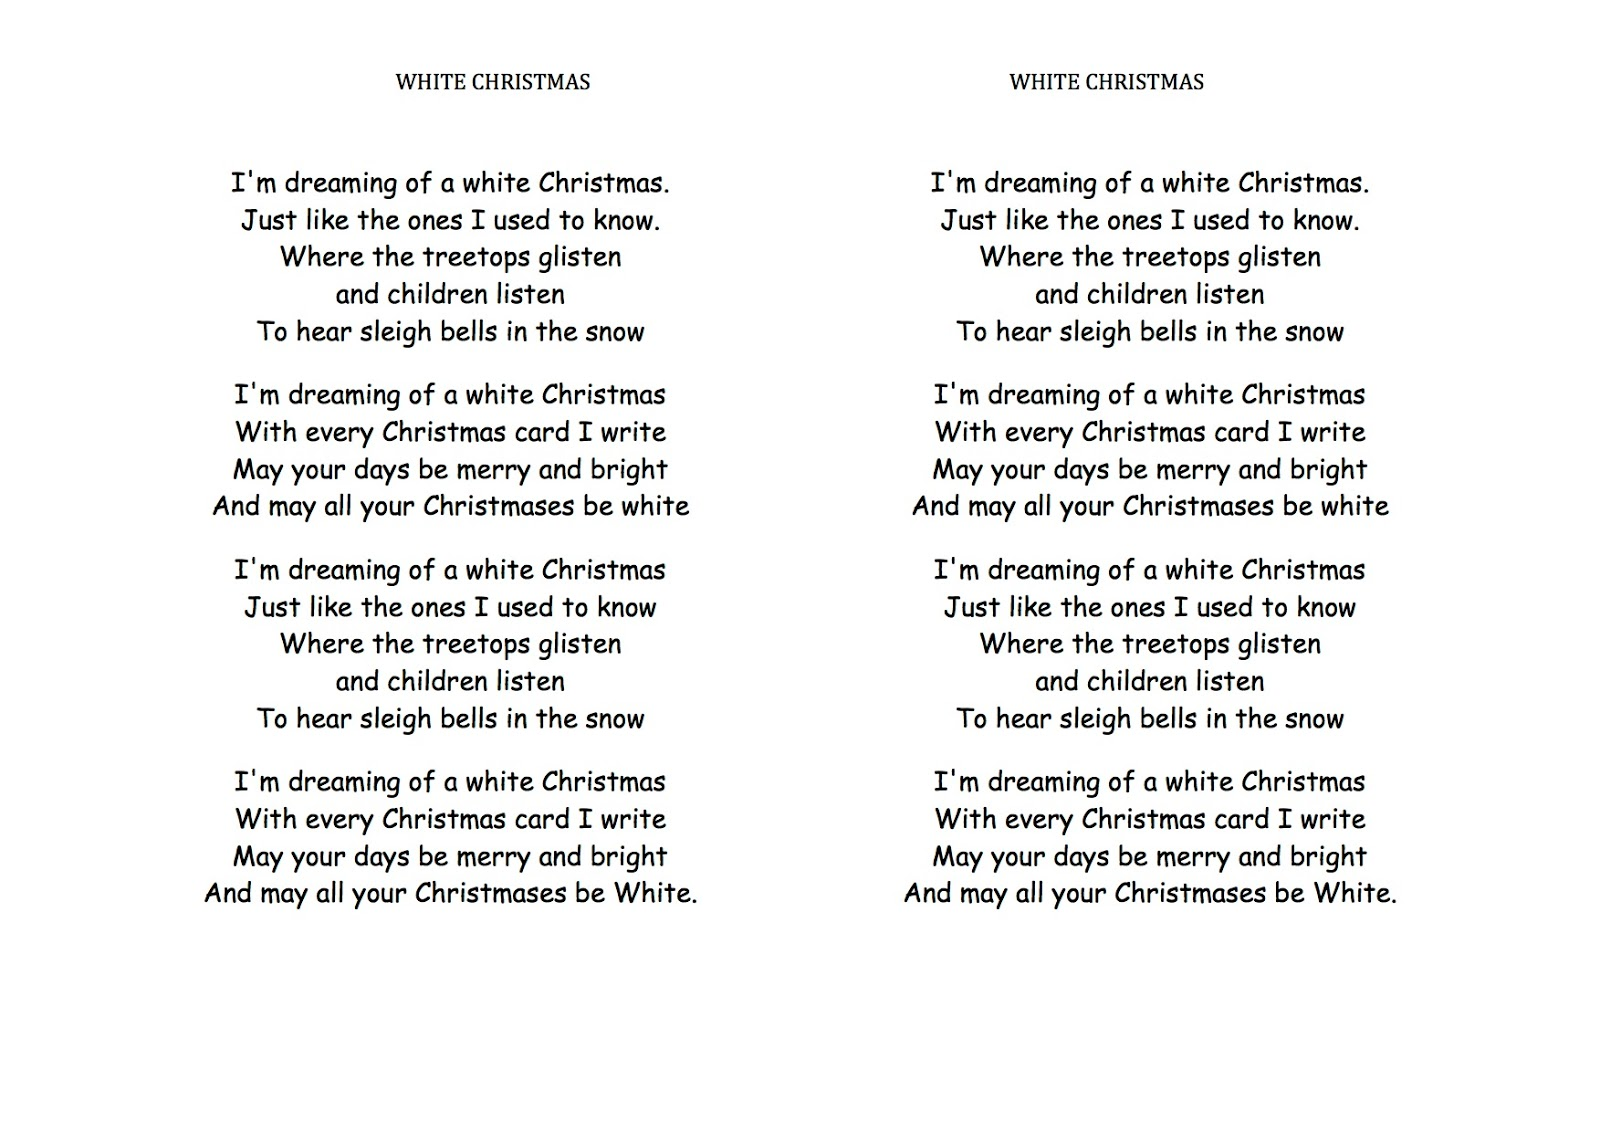 Cancion de navidad white christmas